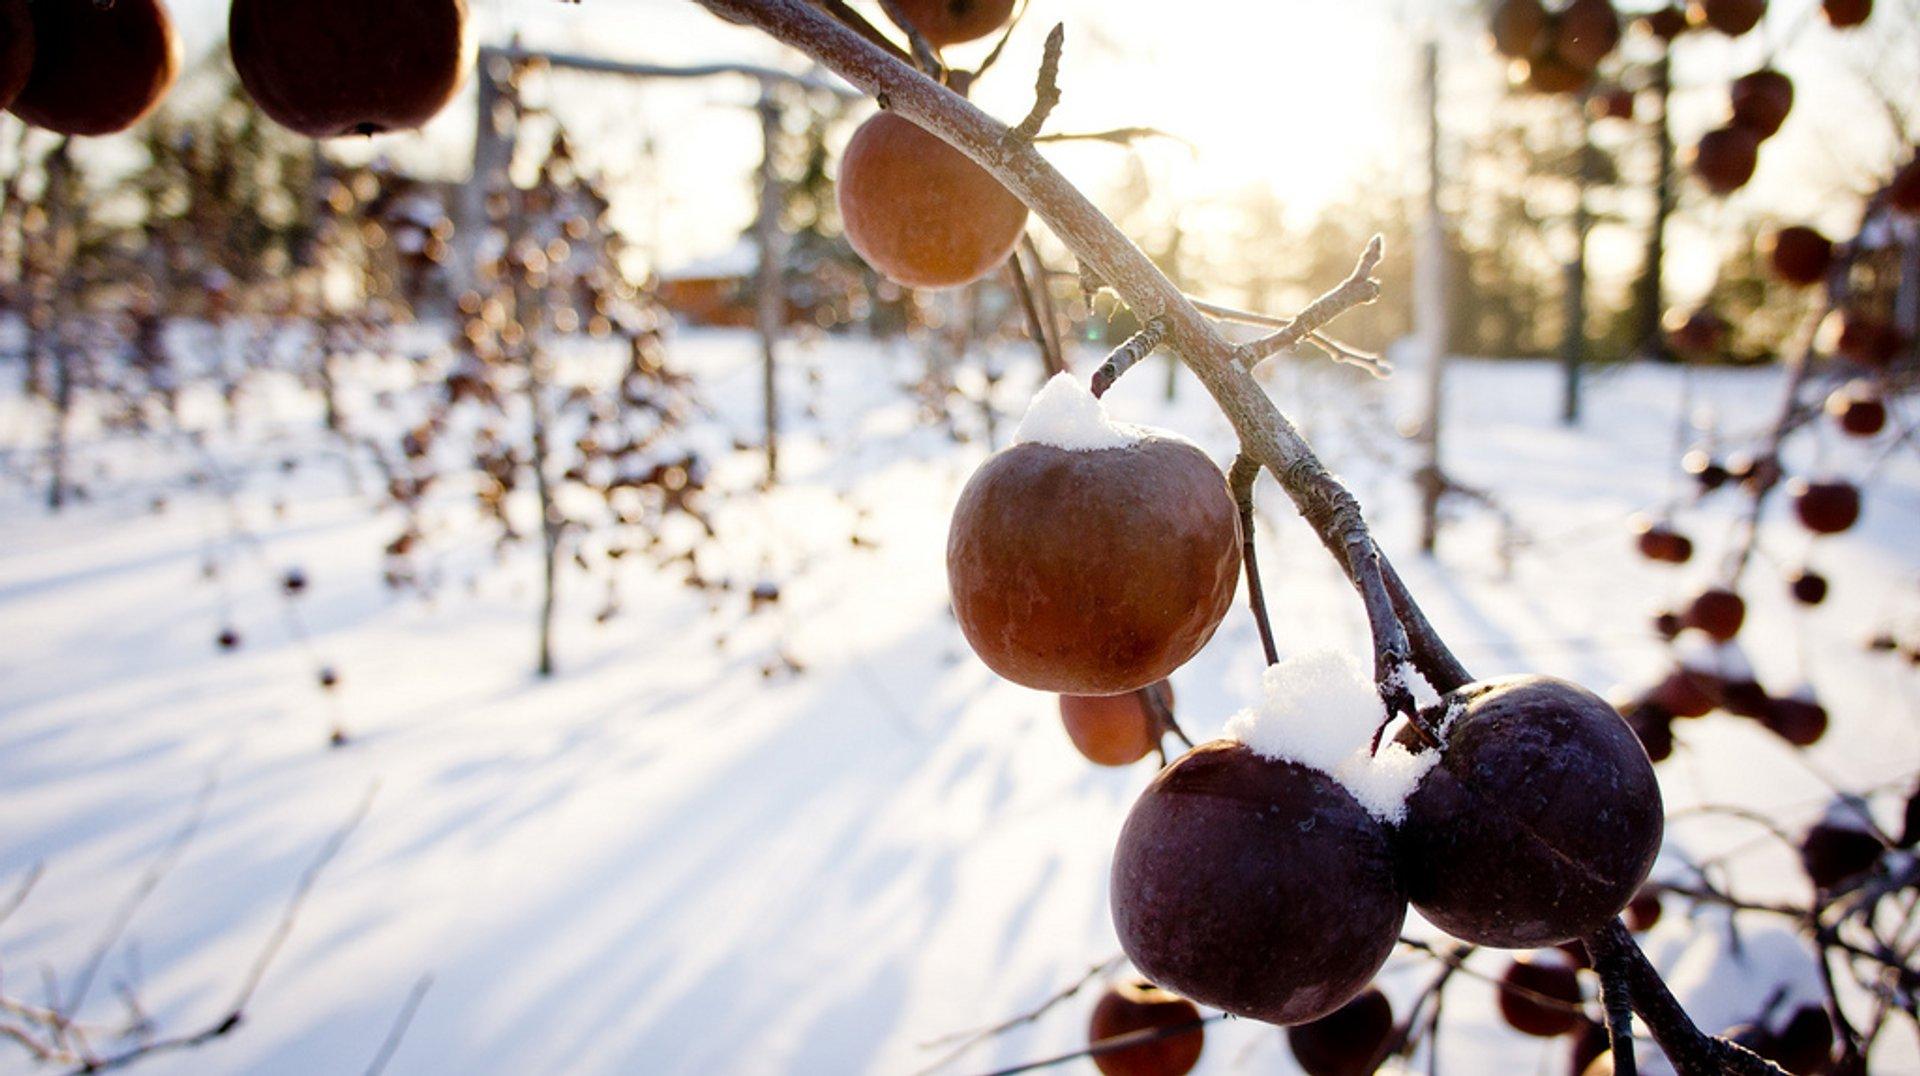 Ice Cider Apple Picking in Quebec - Best Time